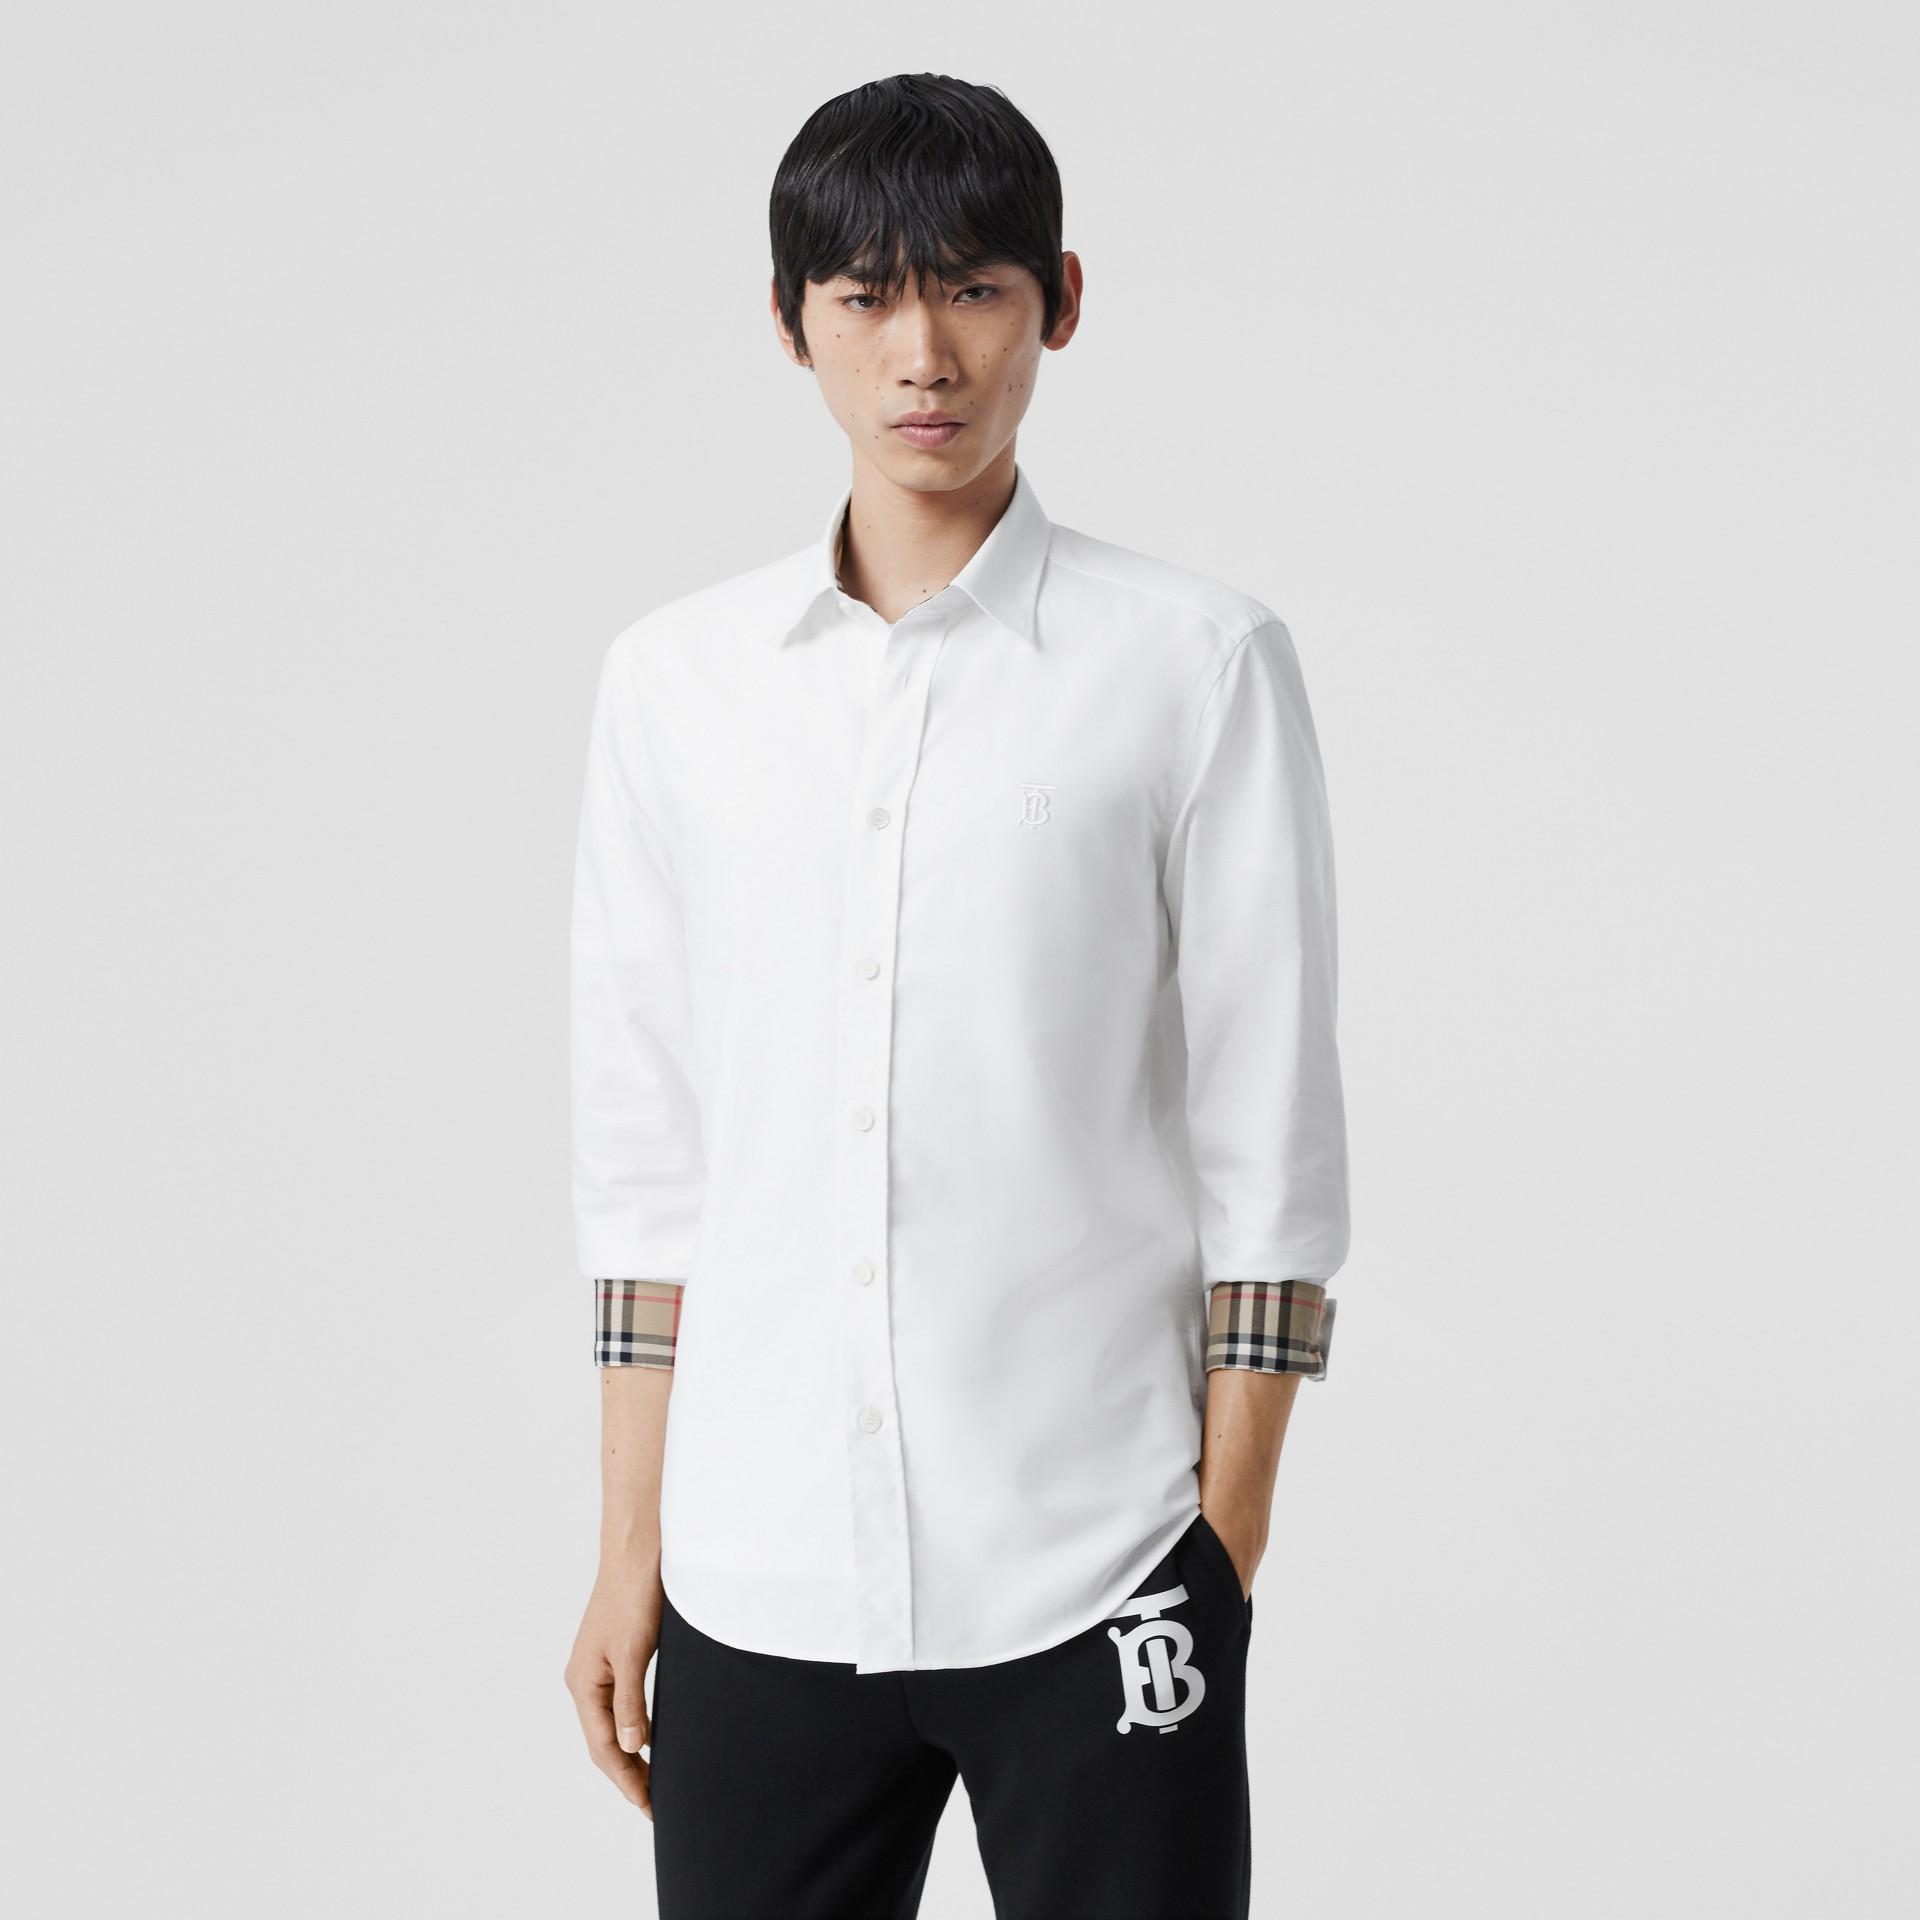 Monogram Motif Cotton Oxford Shirt in White - Men | Burberry Hong Kong S.A.R - gallery image 5